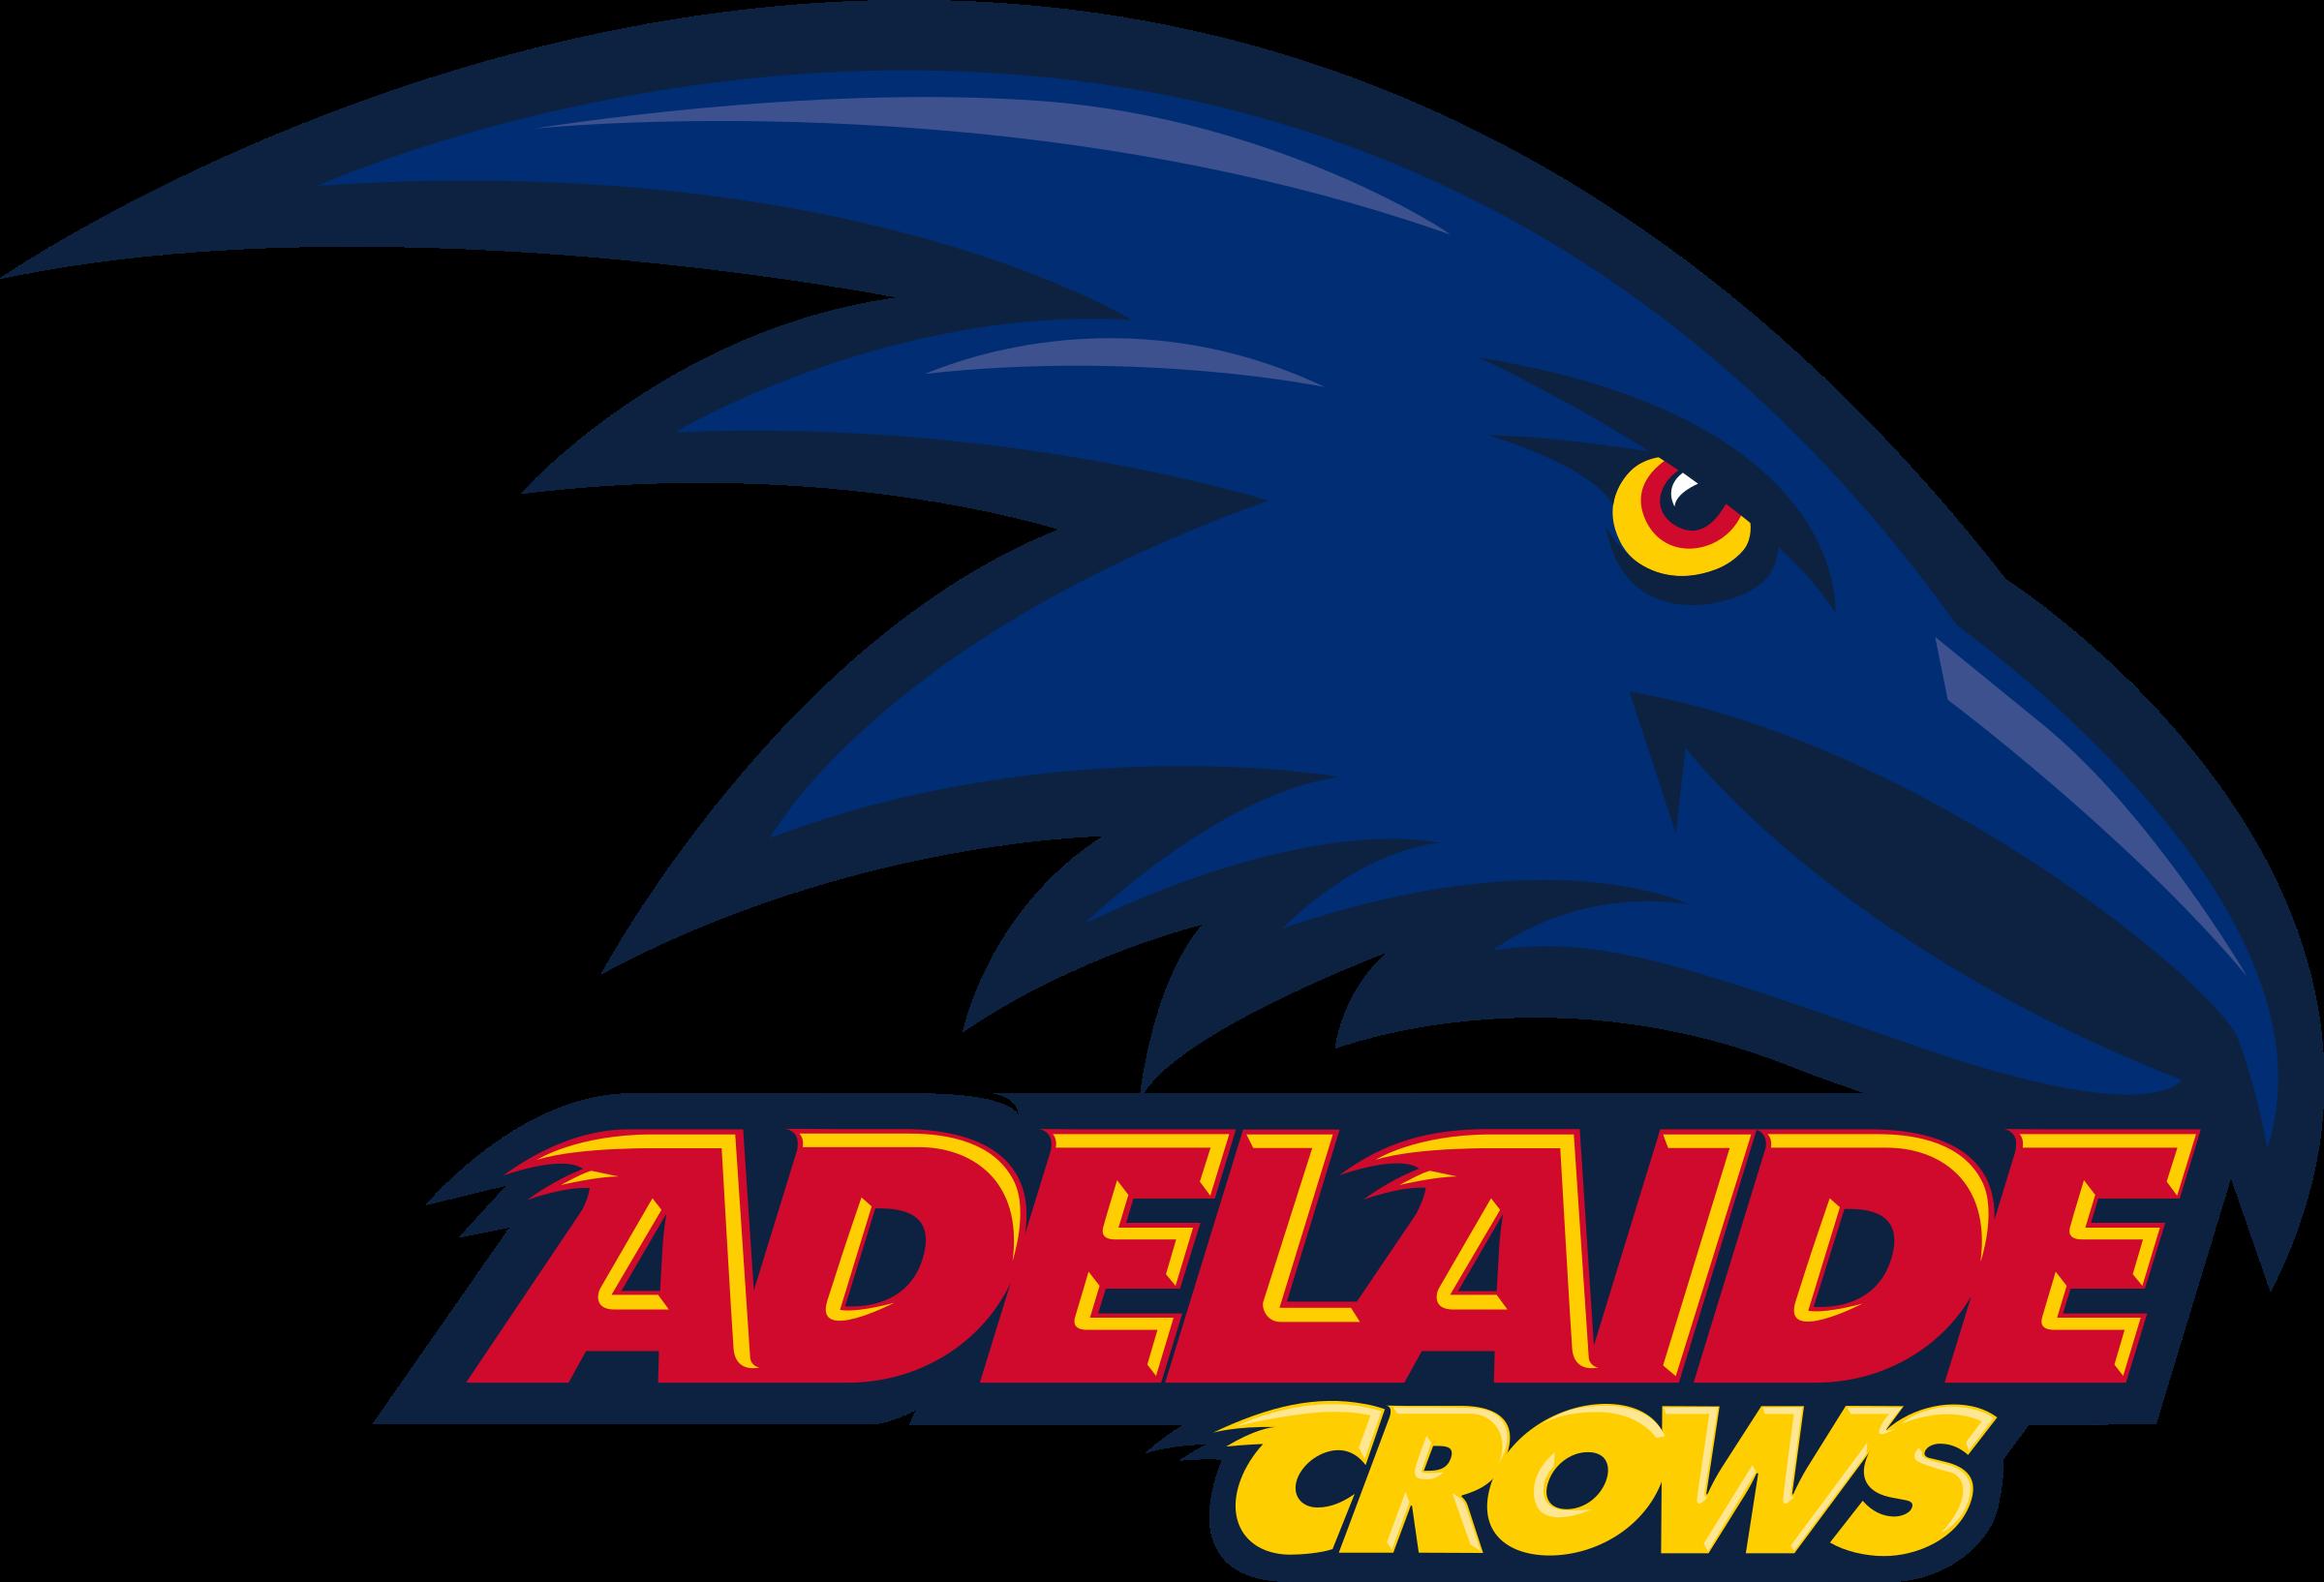 Adelaide Crows Logo Png Transparent Vector Freebie.